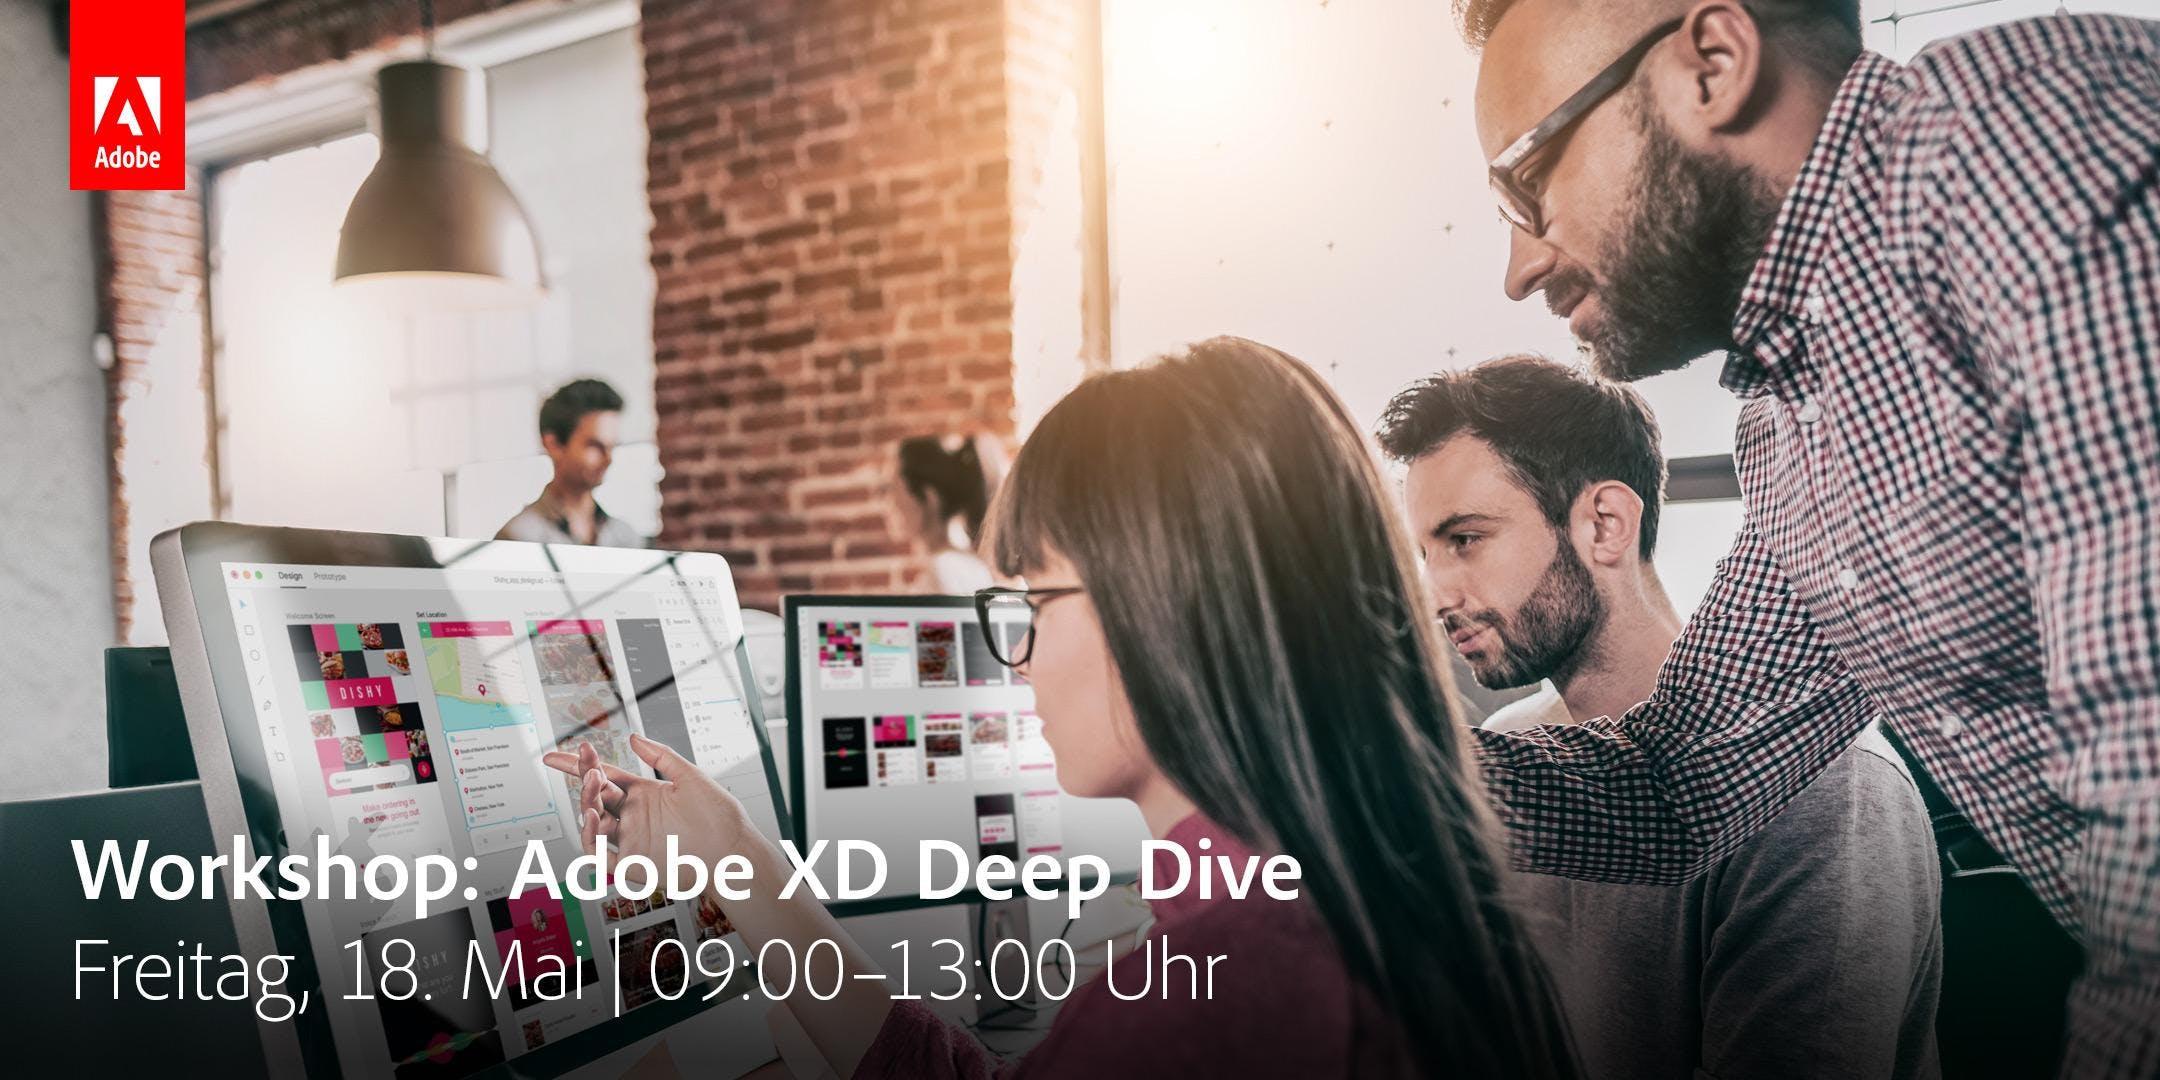 Adobe XD Deep Dive Workshop @ TYPO Berlin